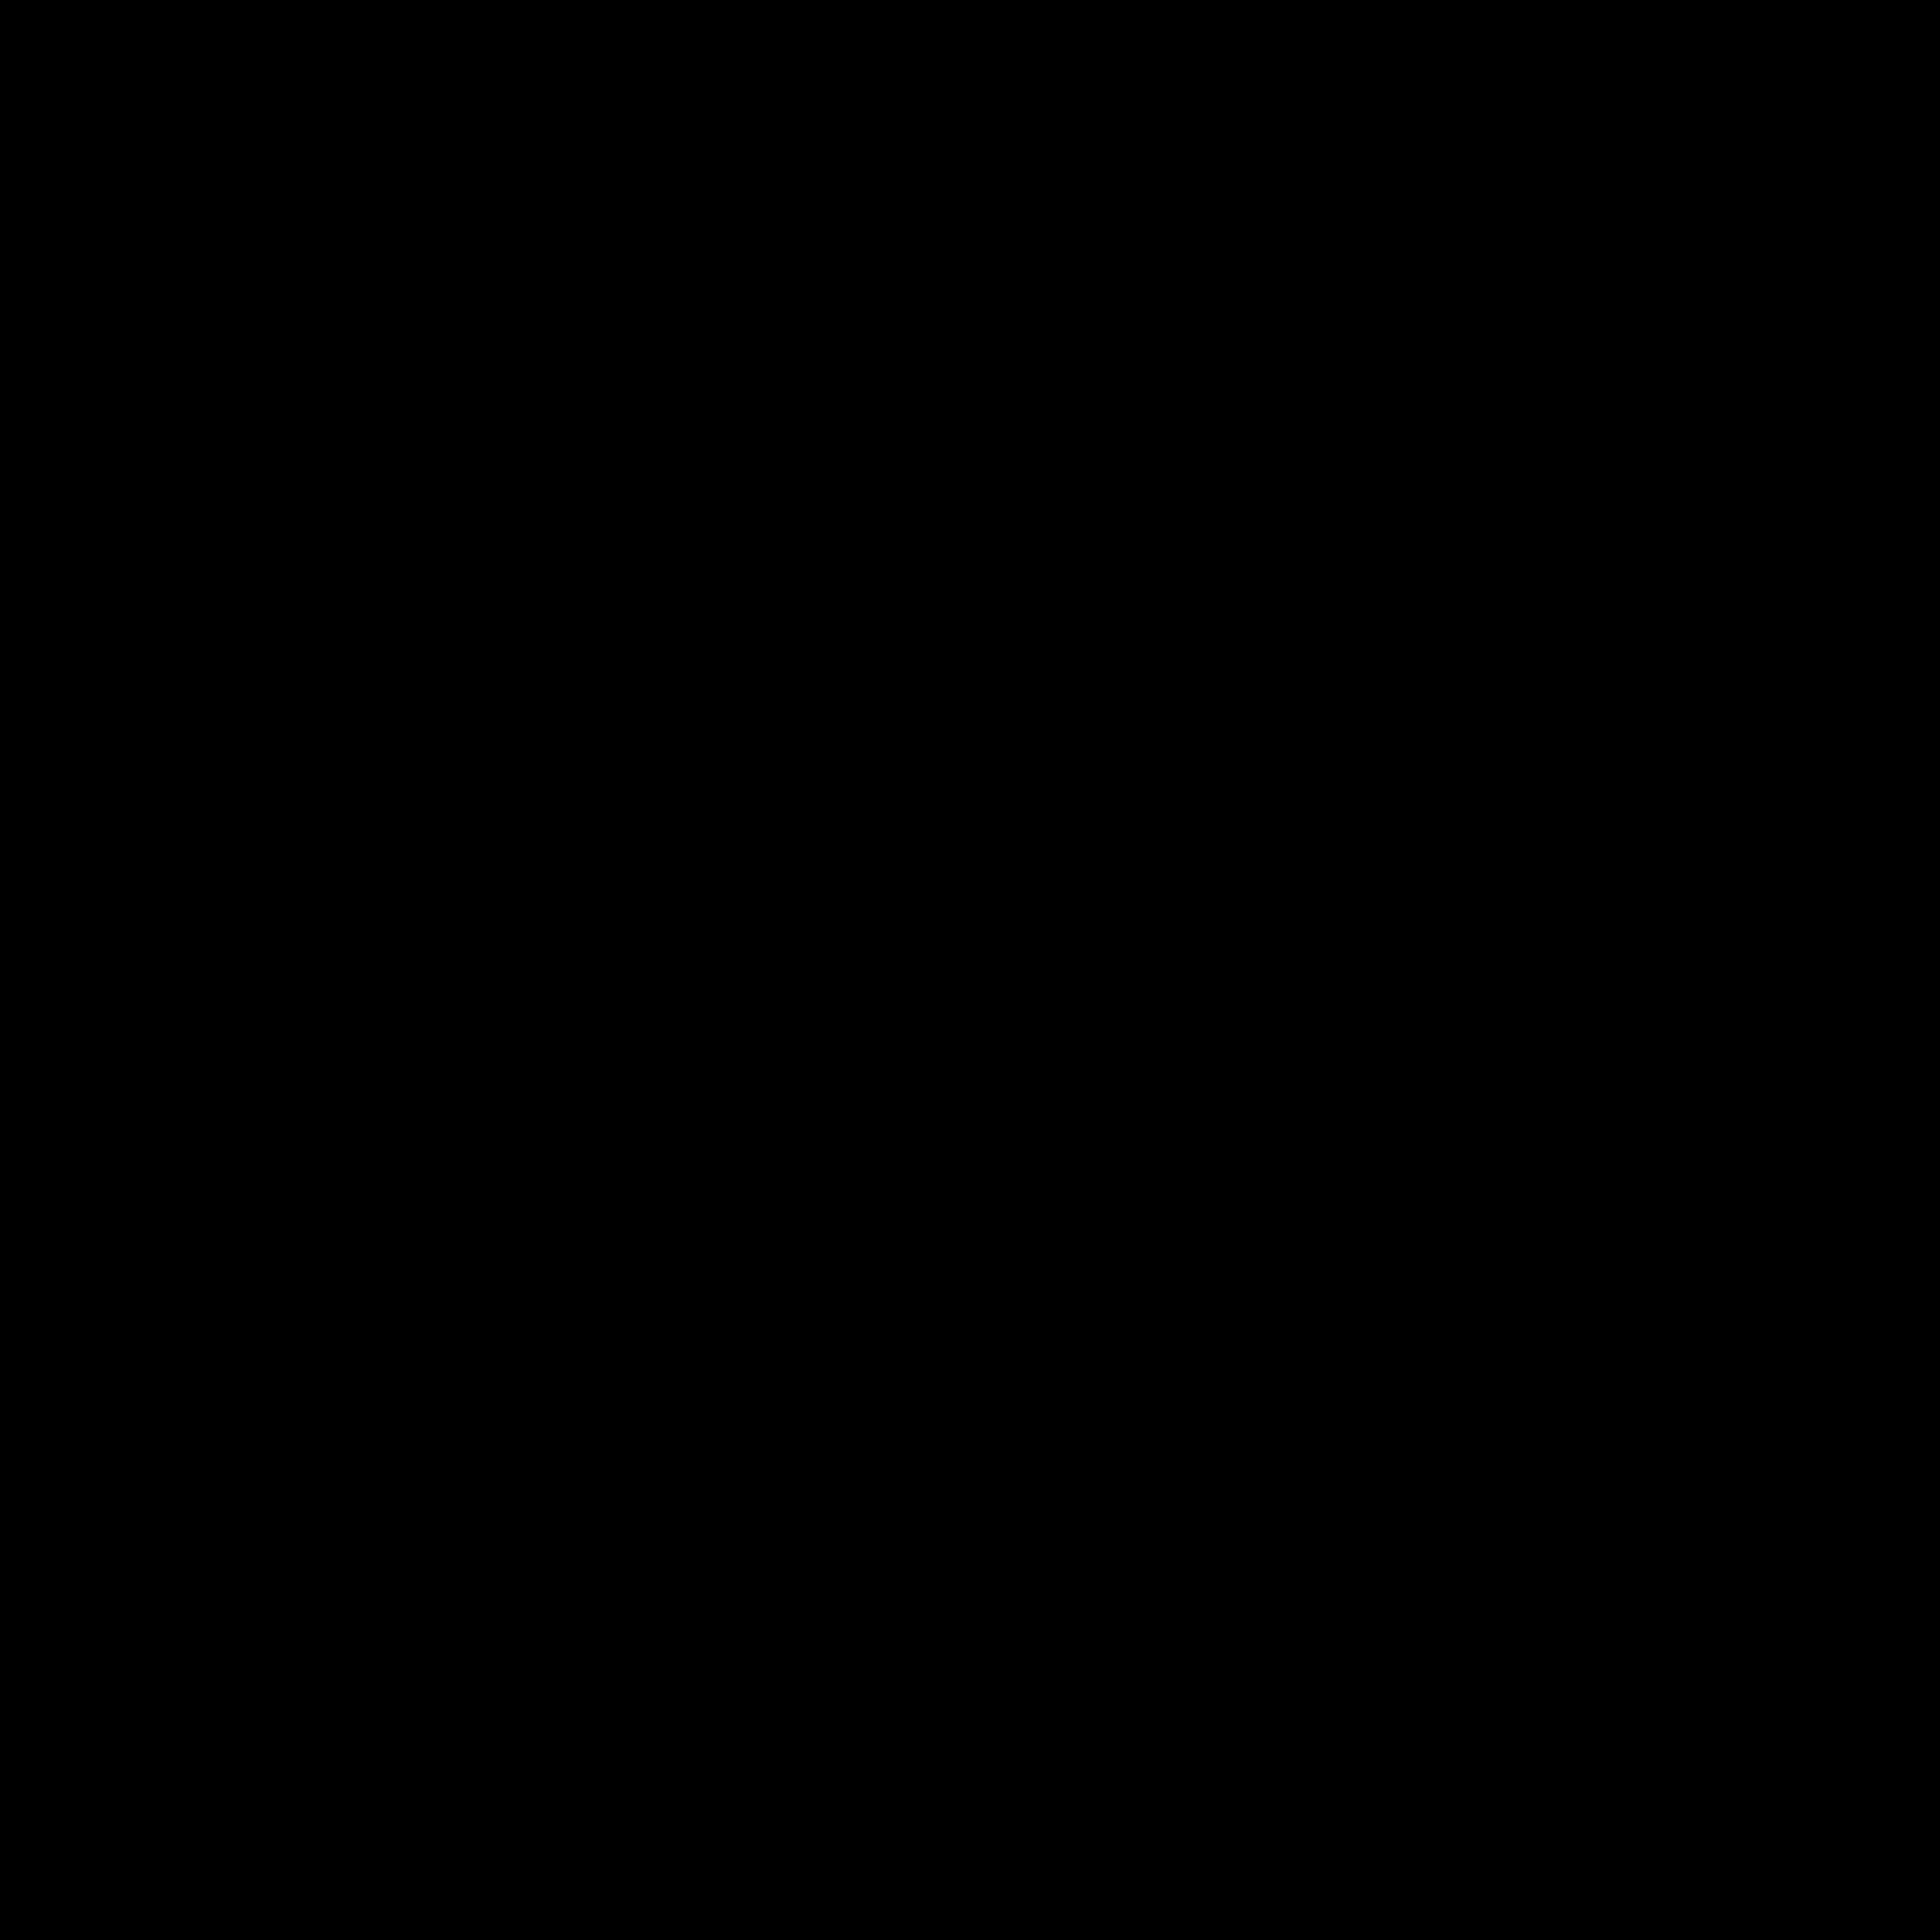 Nike Swoosh Logo Png Transparent Svg Vector Freebie Supply